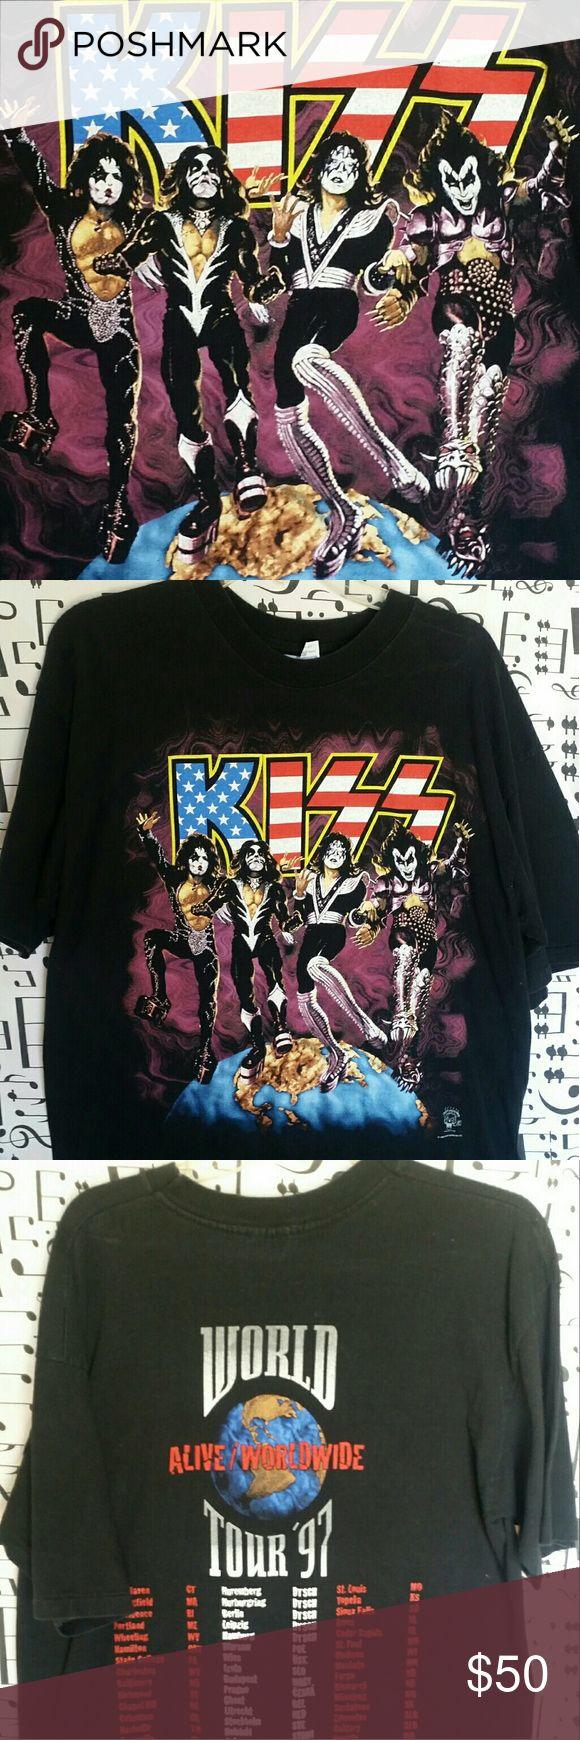 KISS Vintage Rock Tshirt KISS World Tour 1997 Great Condition! Size XL Shirts Tees - Short Sleeve